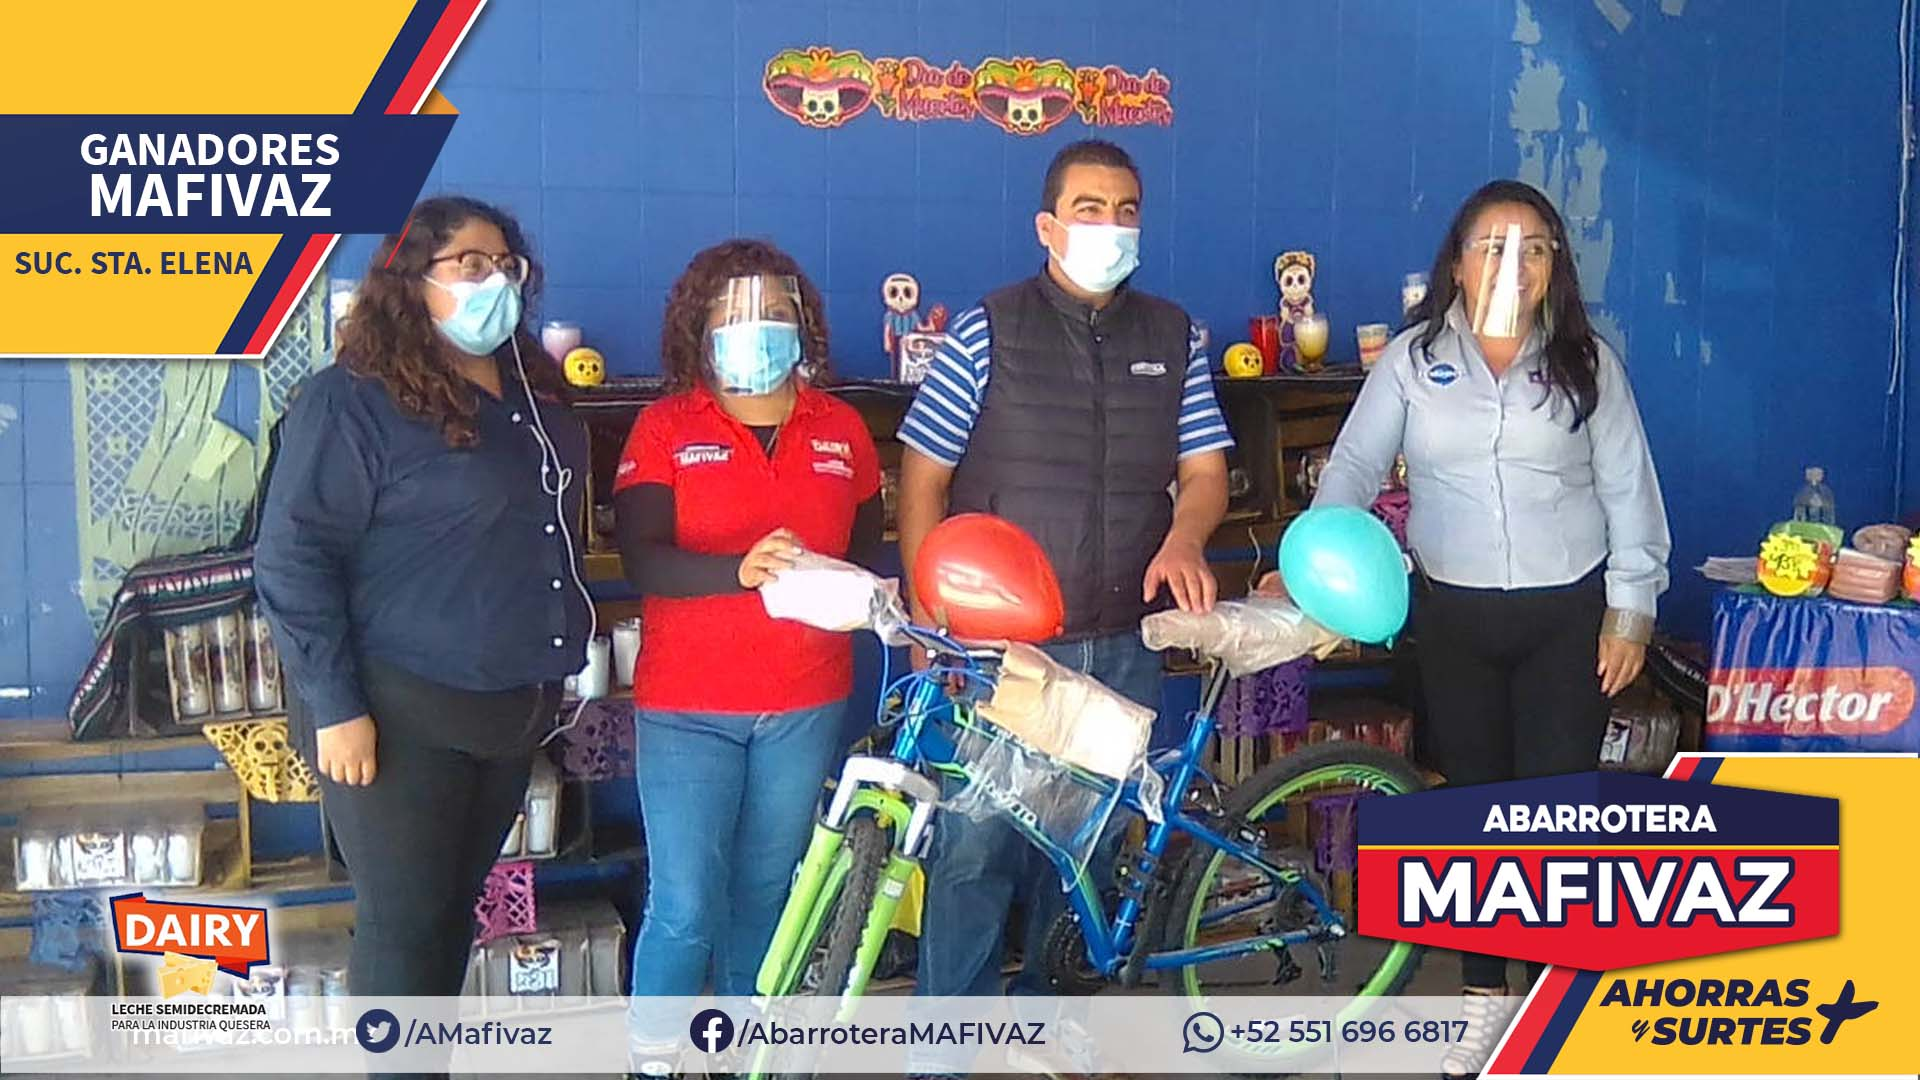 Ganador MAFIVAZ Santa Elena yoghurízate con LALA